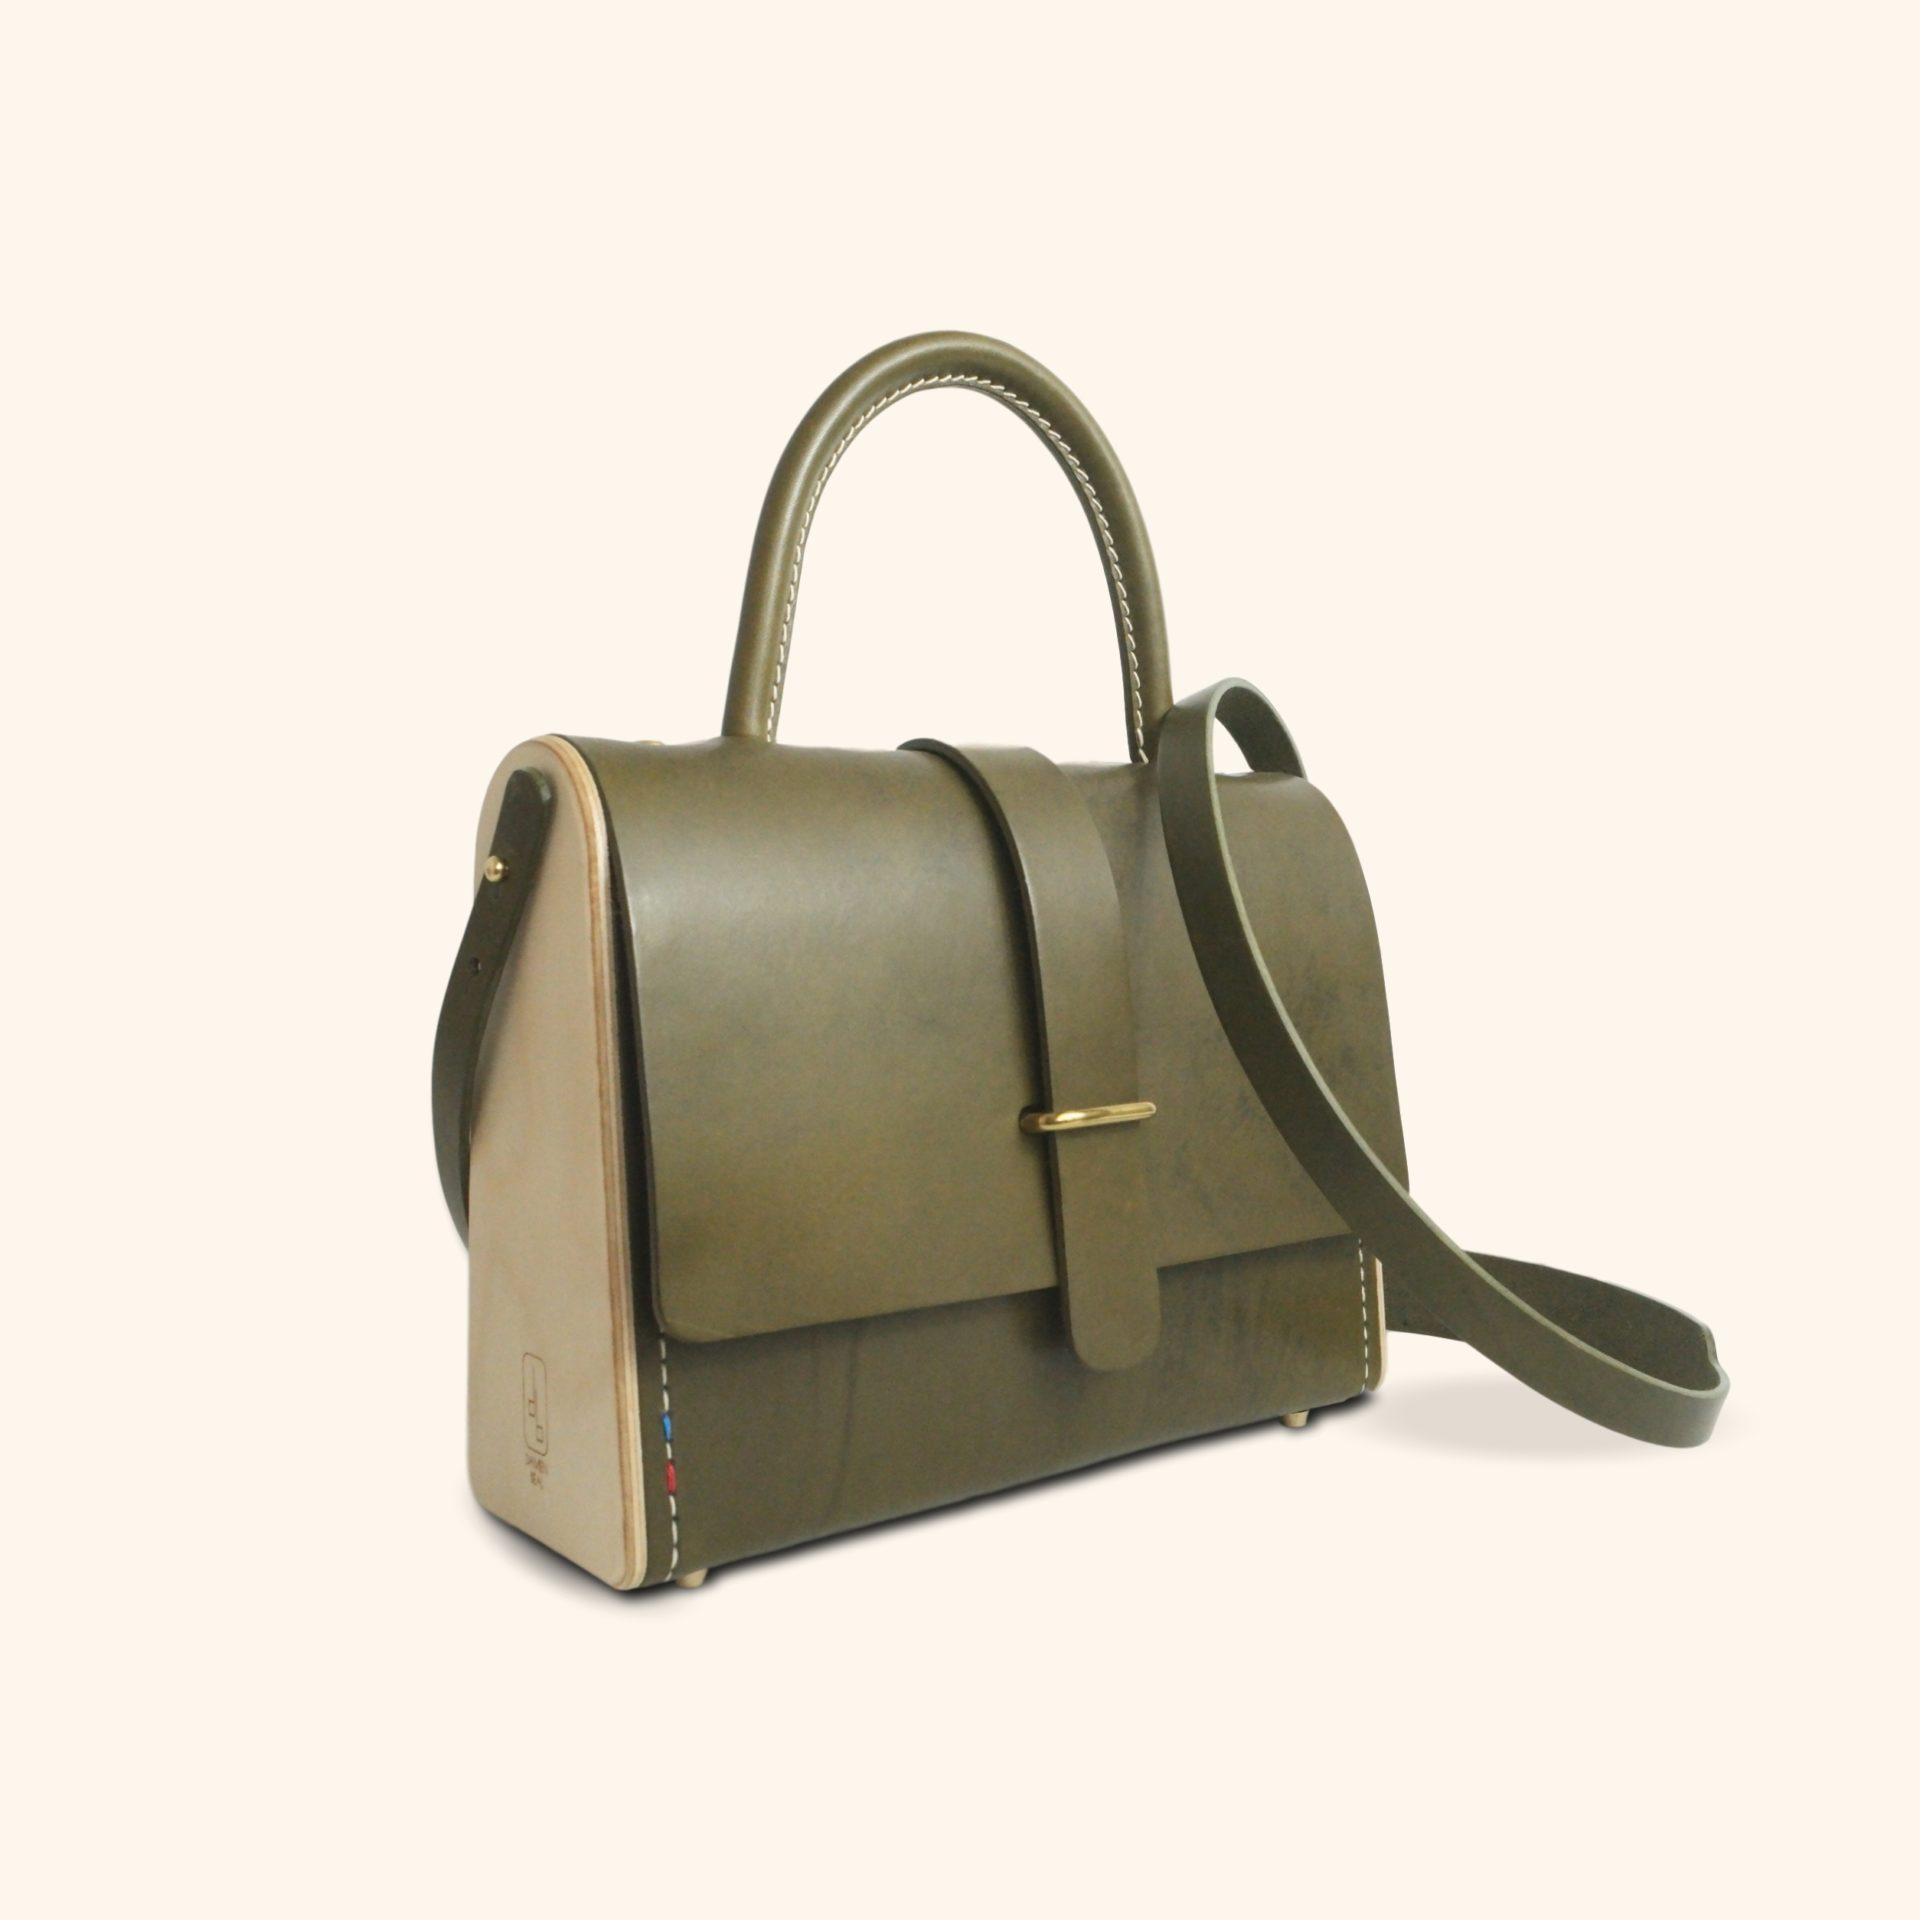 2541145acf58f La Ninetta - sac à main féminin en bois et cuir